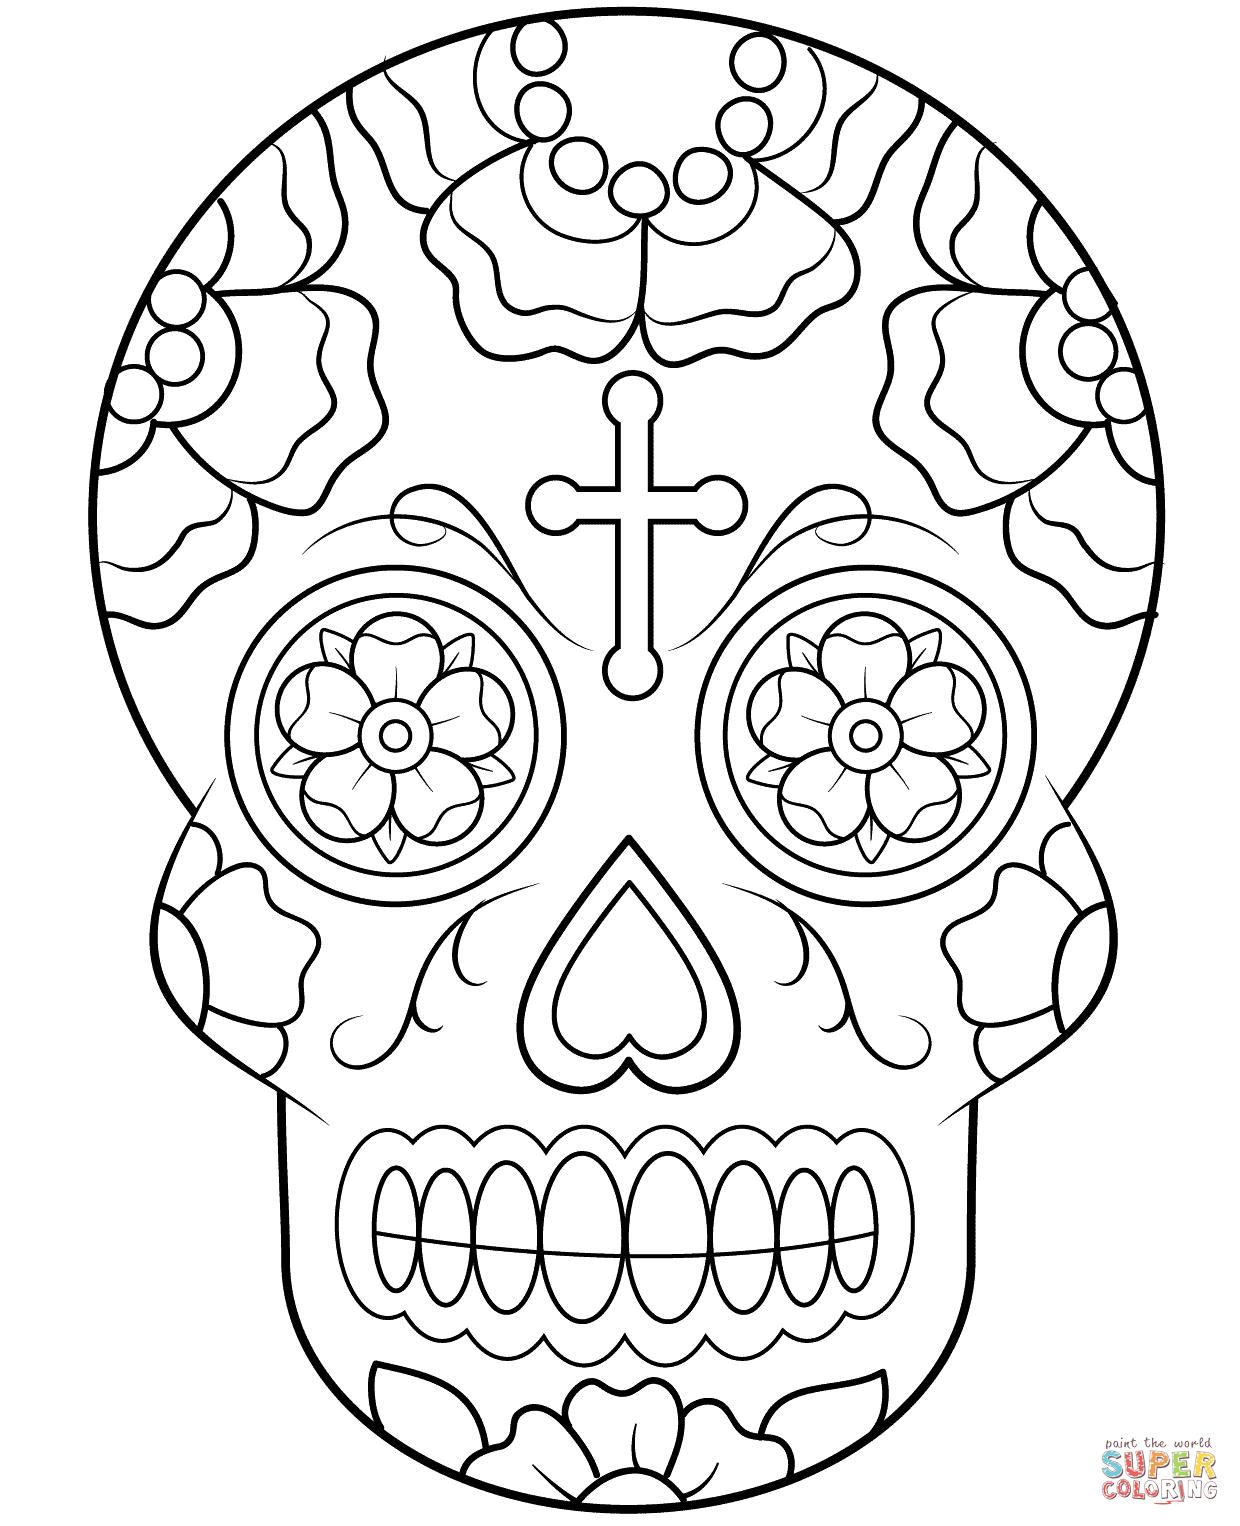 Calavera (Sugar Skull) | Super Coloring | Coloring Pages | Pinterest